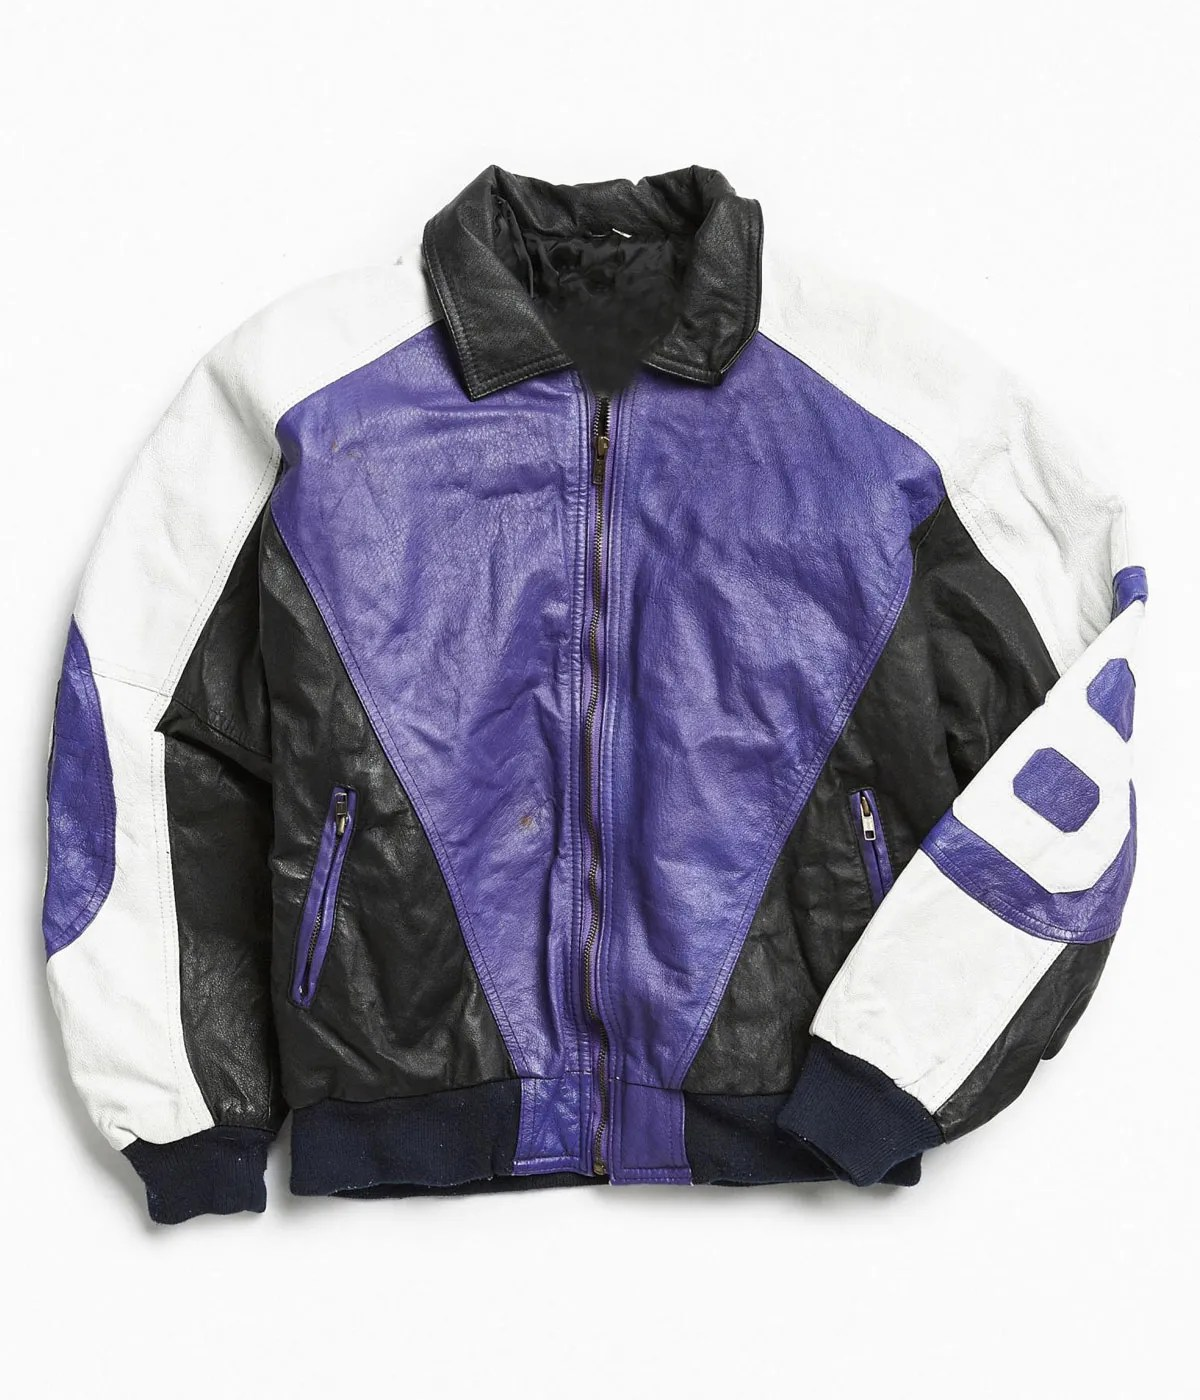 8-ball-jacket-purple